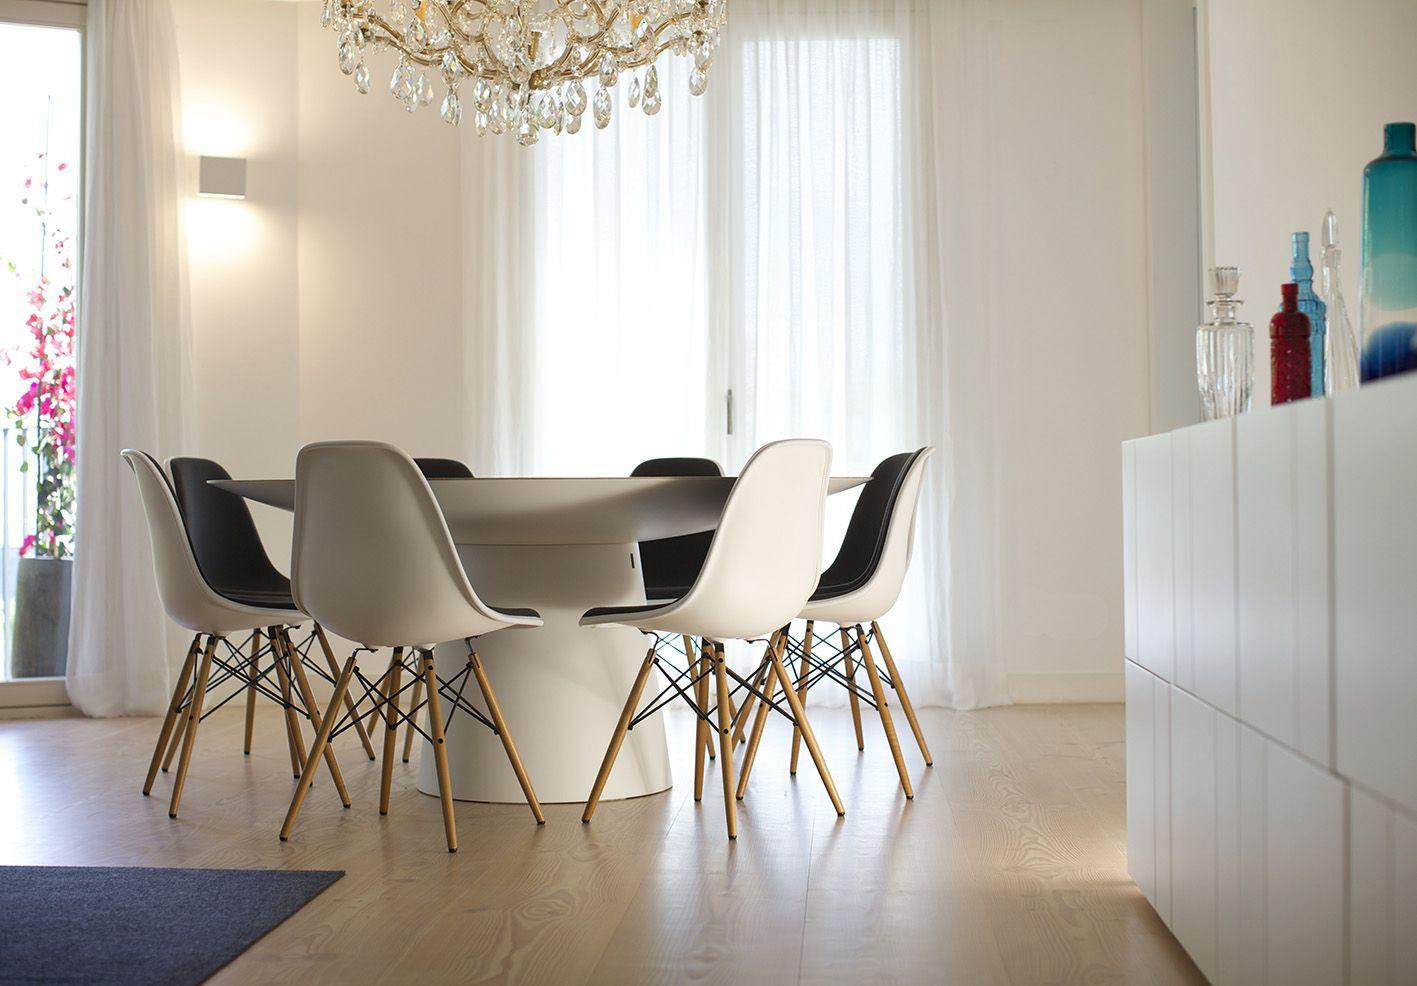 Modern and Eclectic Dining Area _ Sala de refeições de estilo moderno e ecléctico,  Photo by Ricardo Bravo